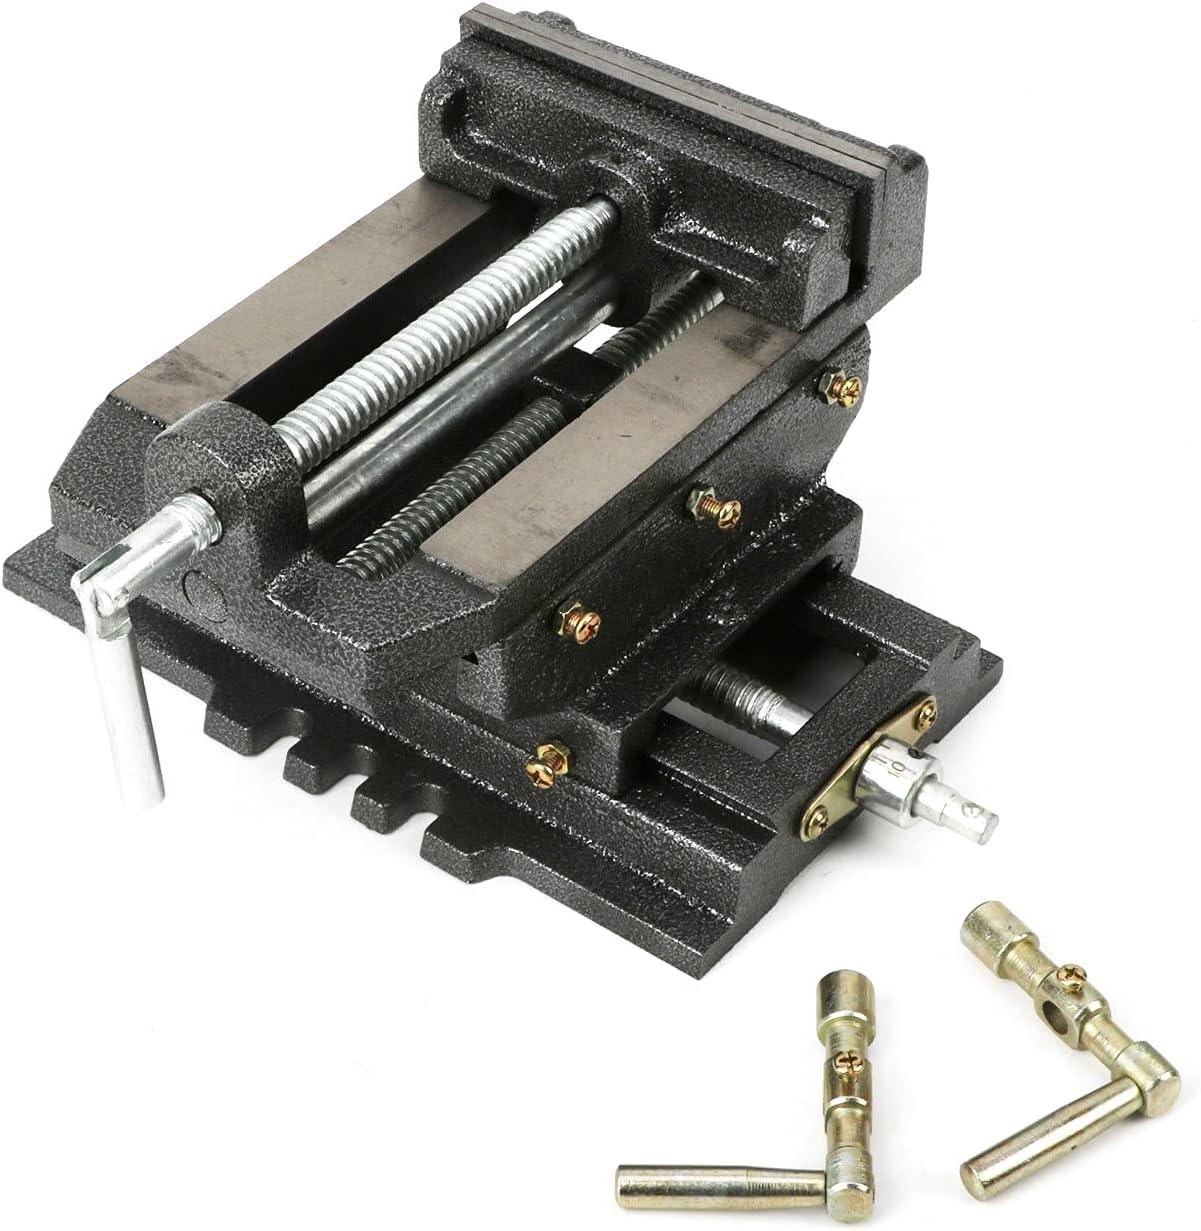 jxgzyy 6 Inch X-Y Compound Drill Sli Cross New product!! Vise Heavy Duty Max 70% OFF Press